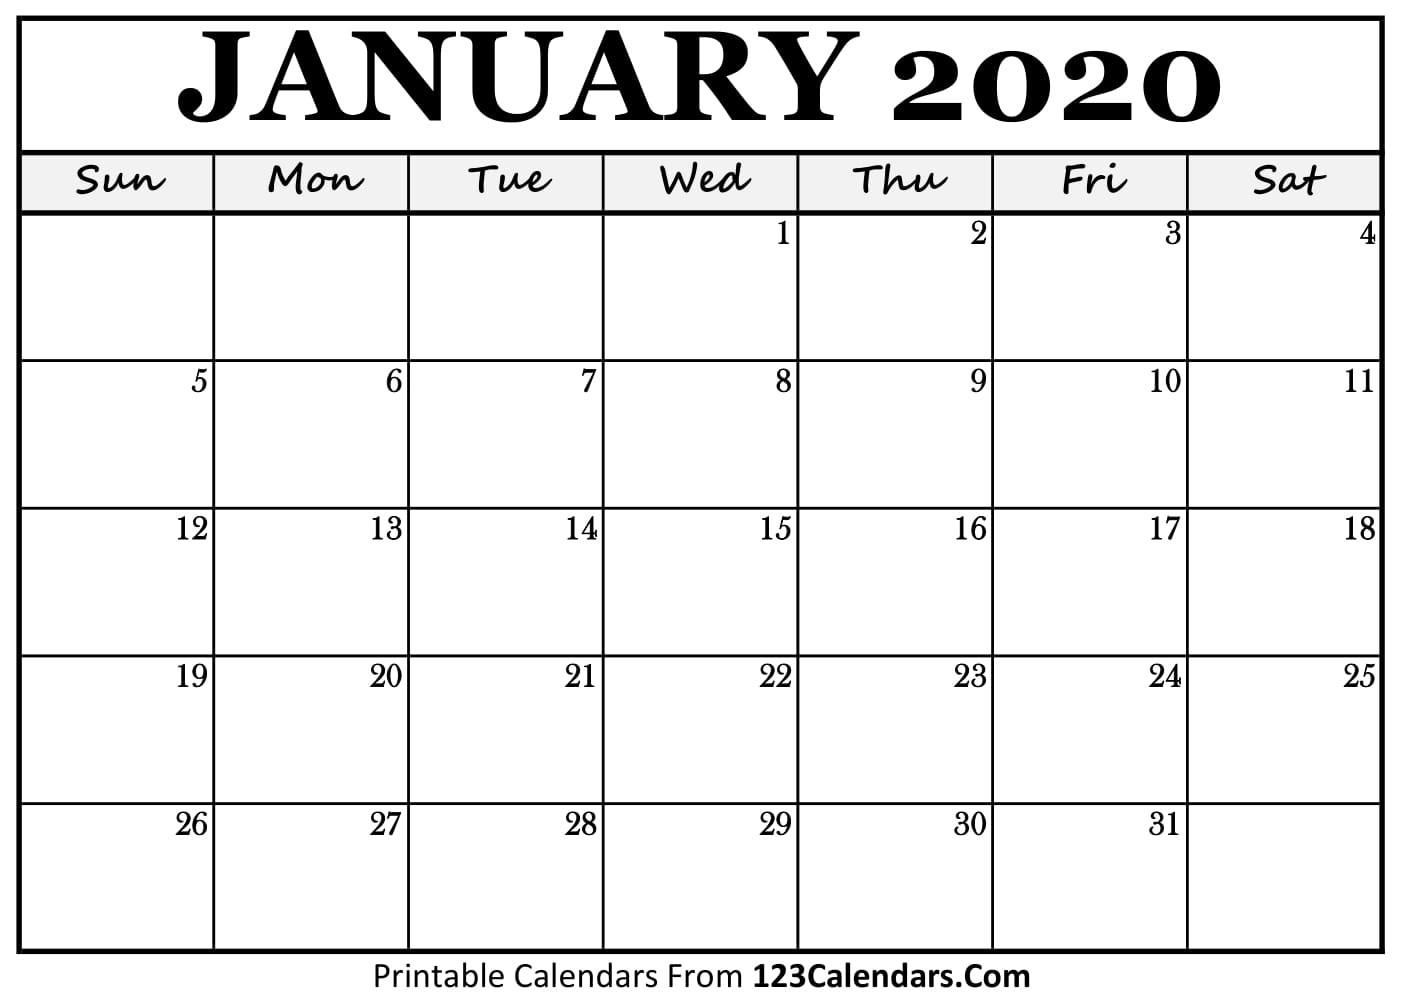 Free Printable Calendar | 123Calendars-Monthly Calendar Sheets 2020